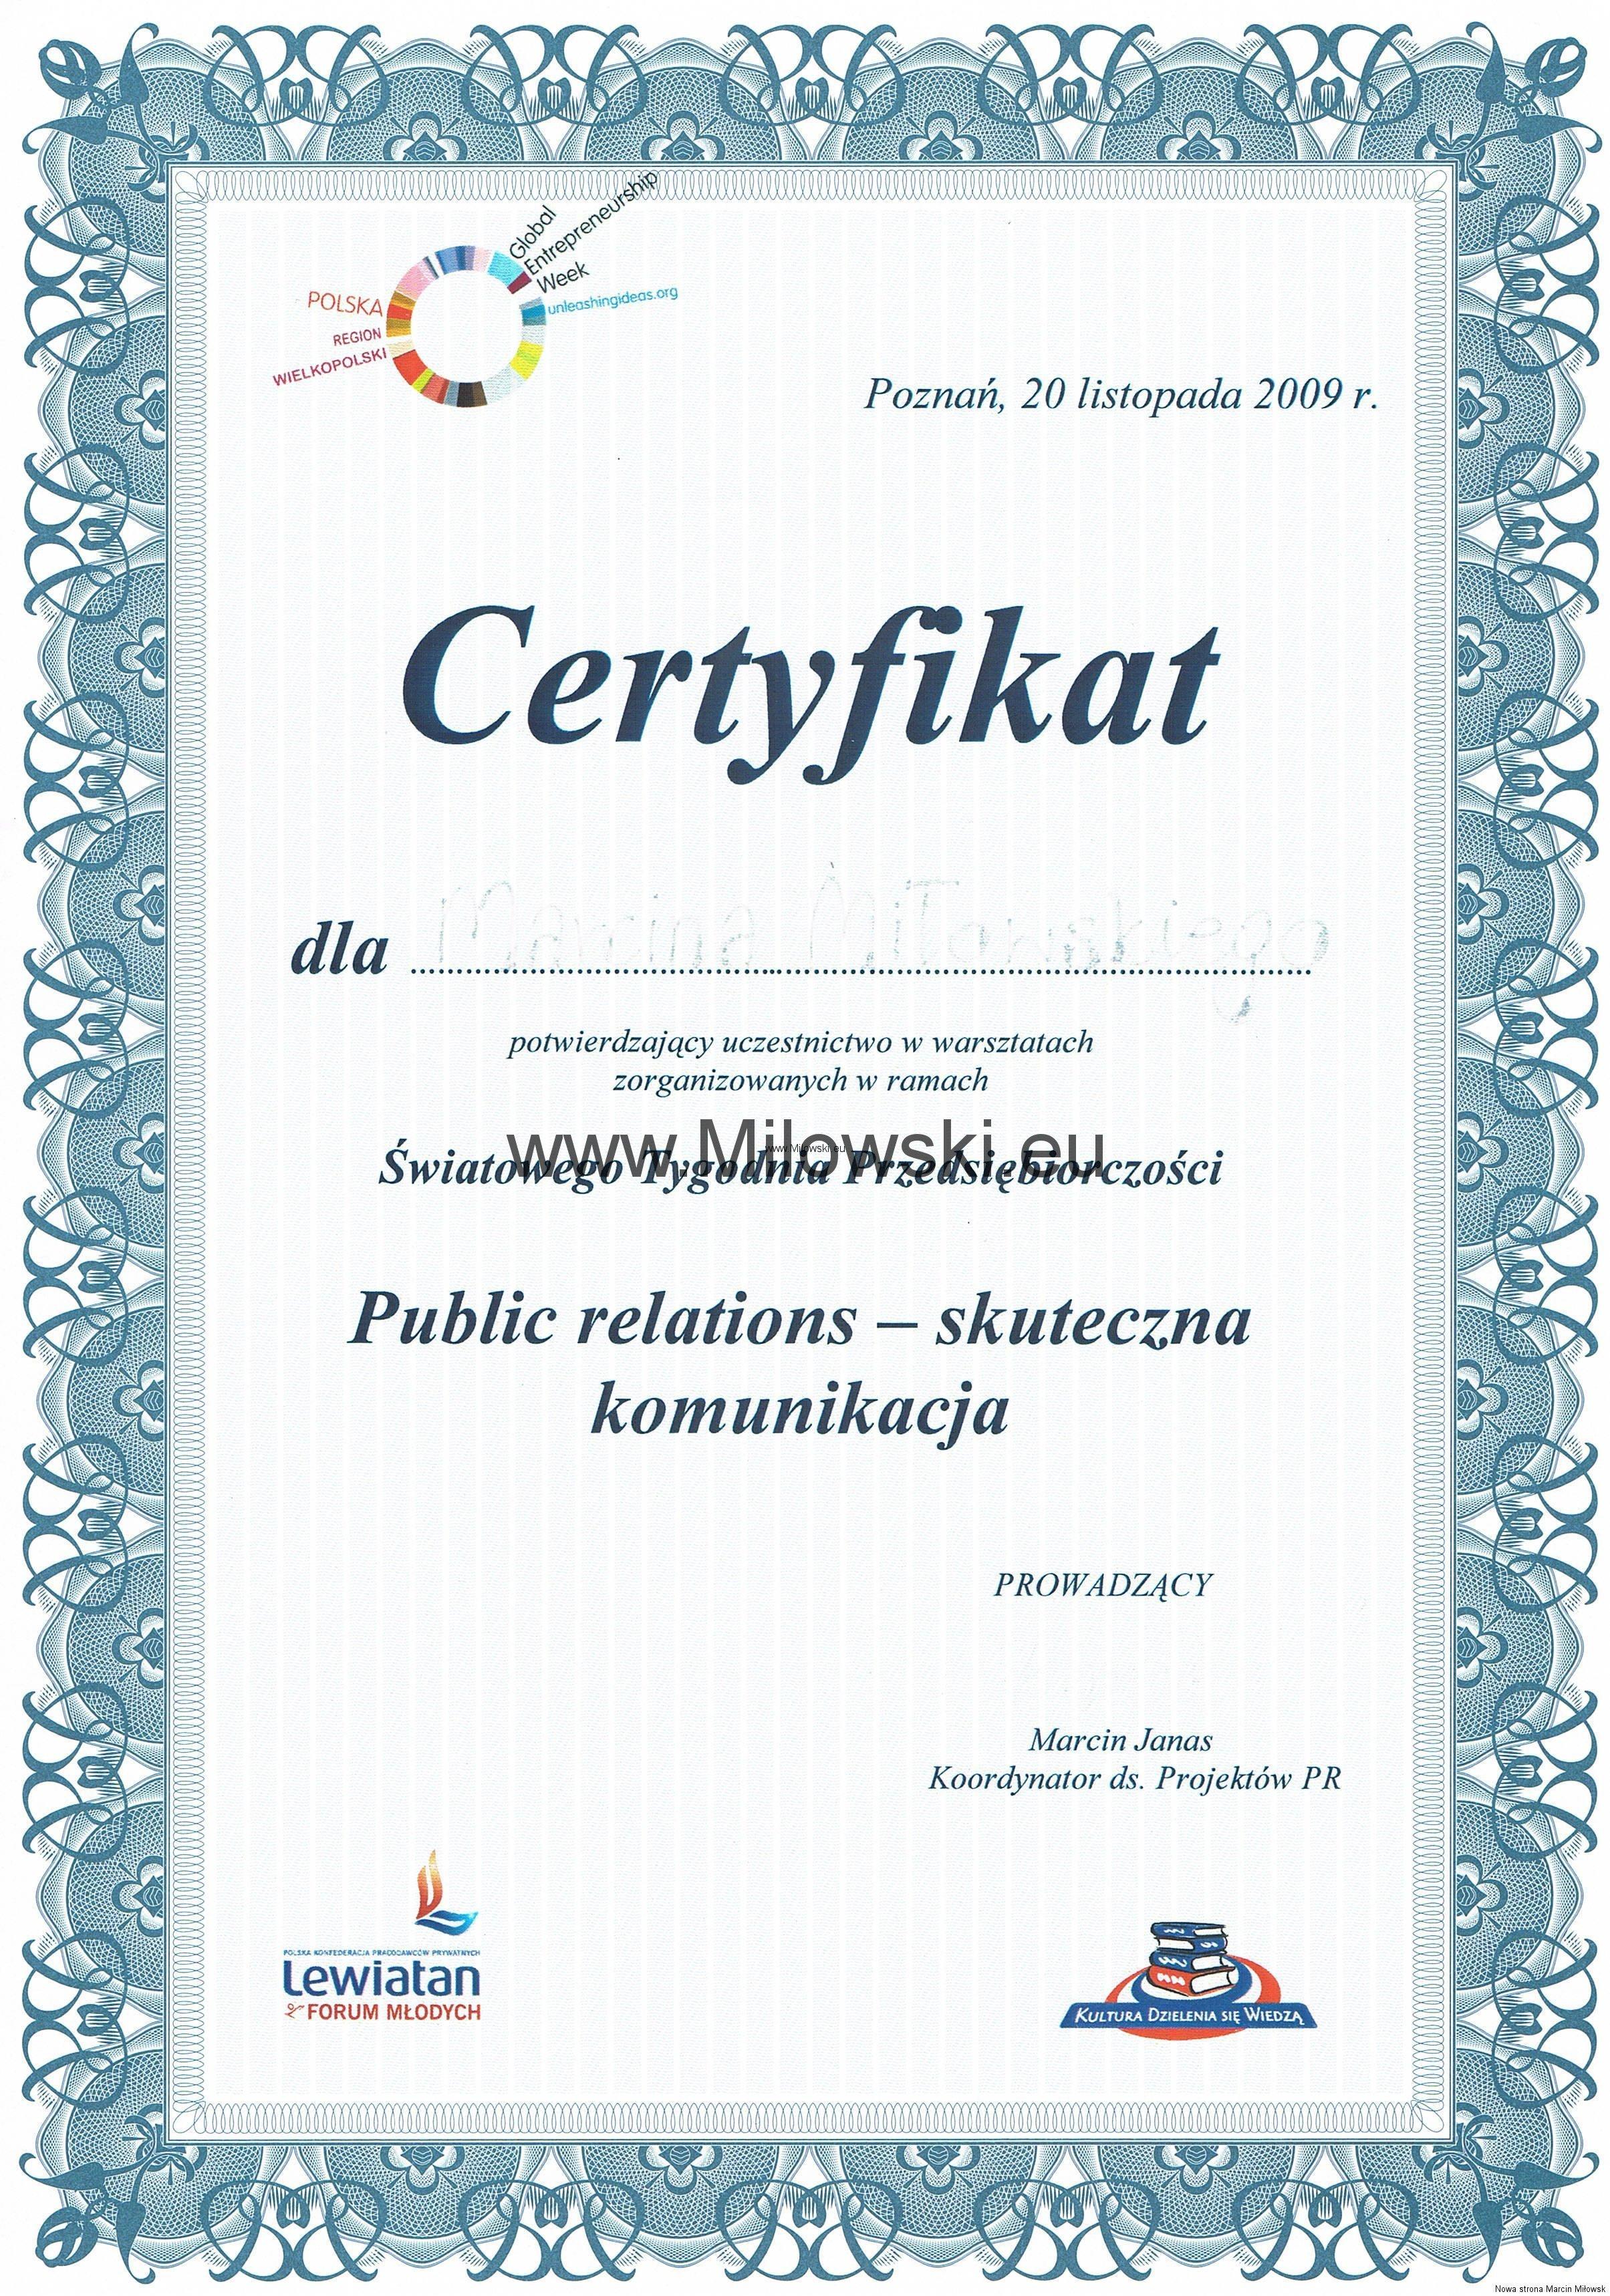 ccf20130112_00002